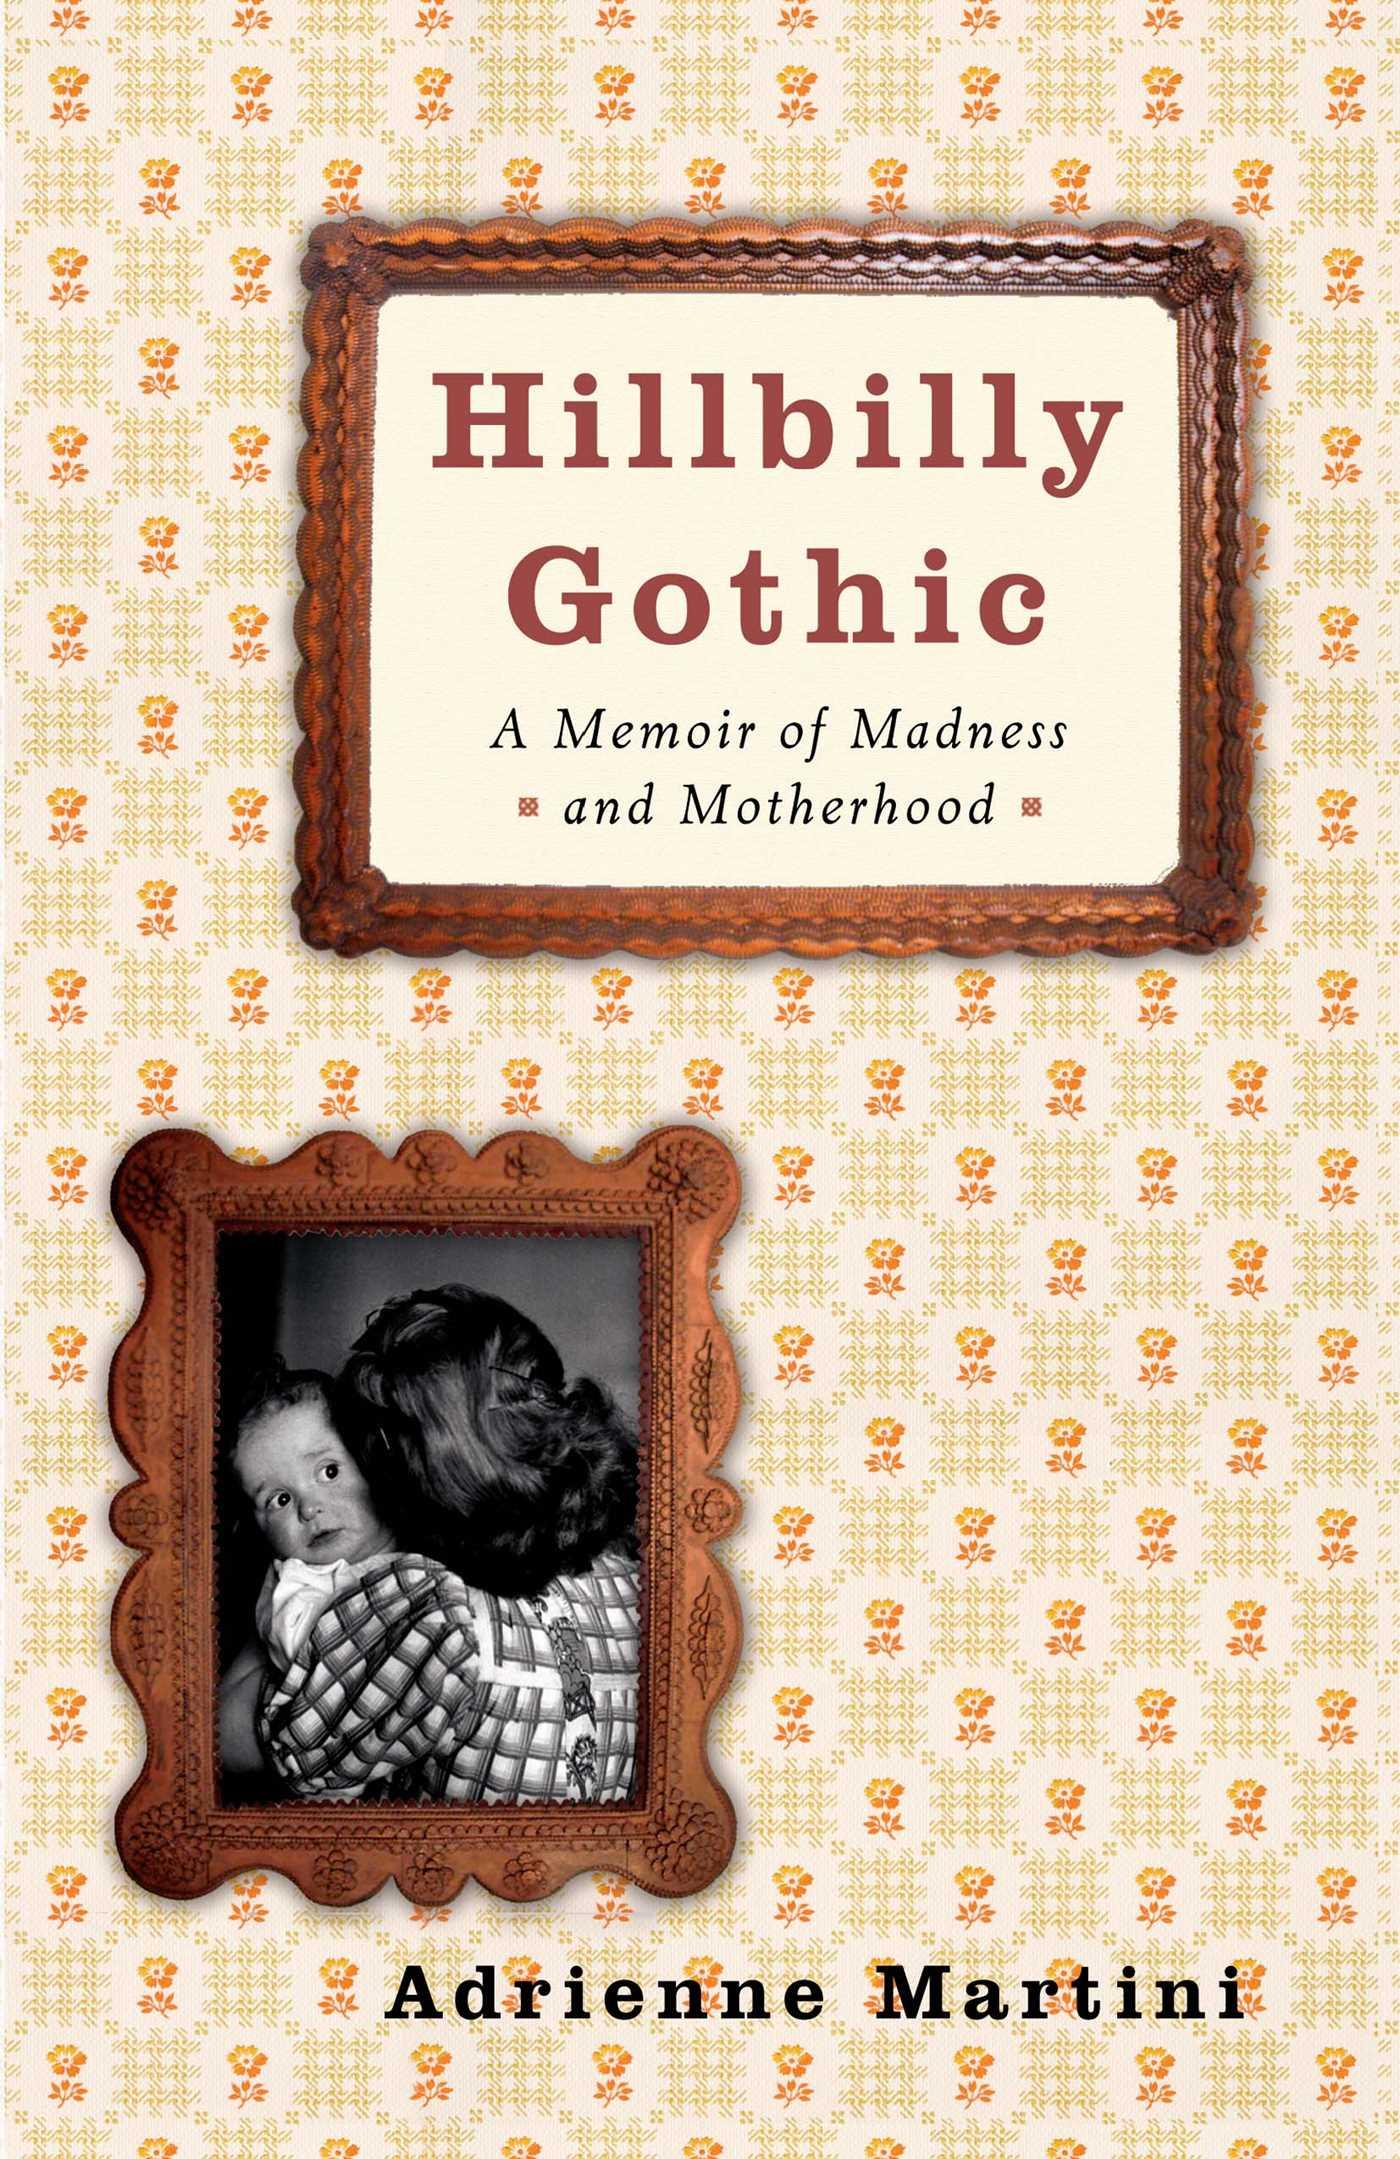 Hillbilly gothic 9780743272766 hr